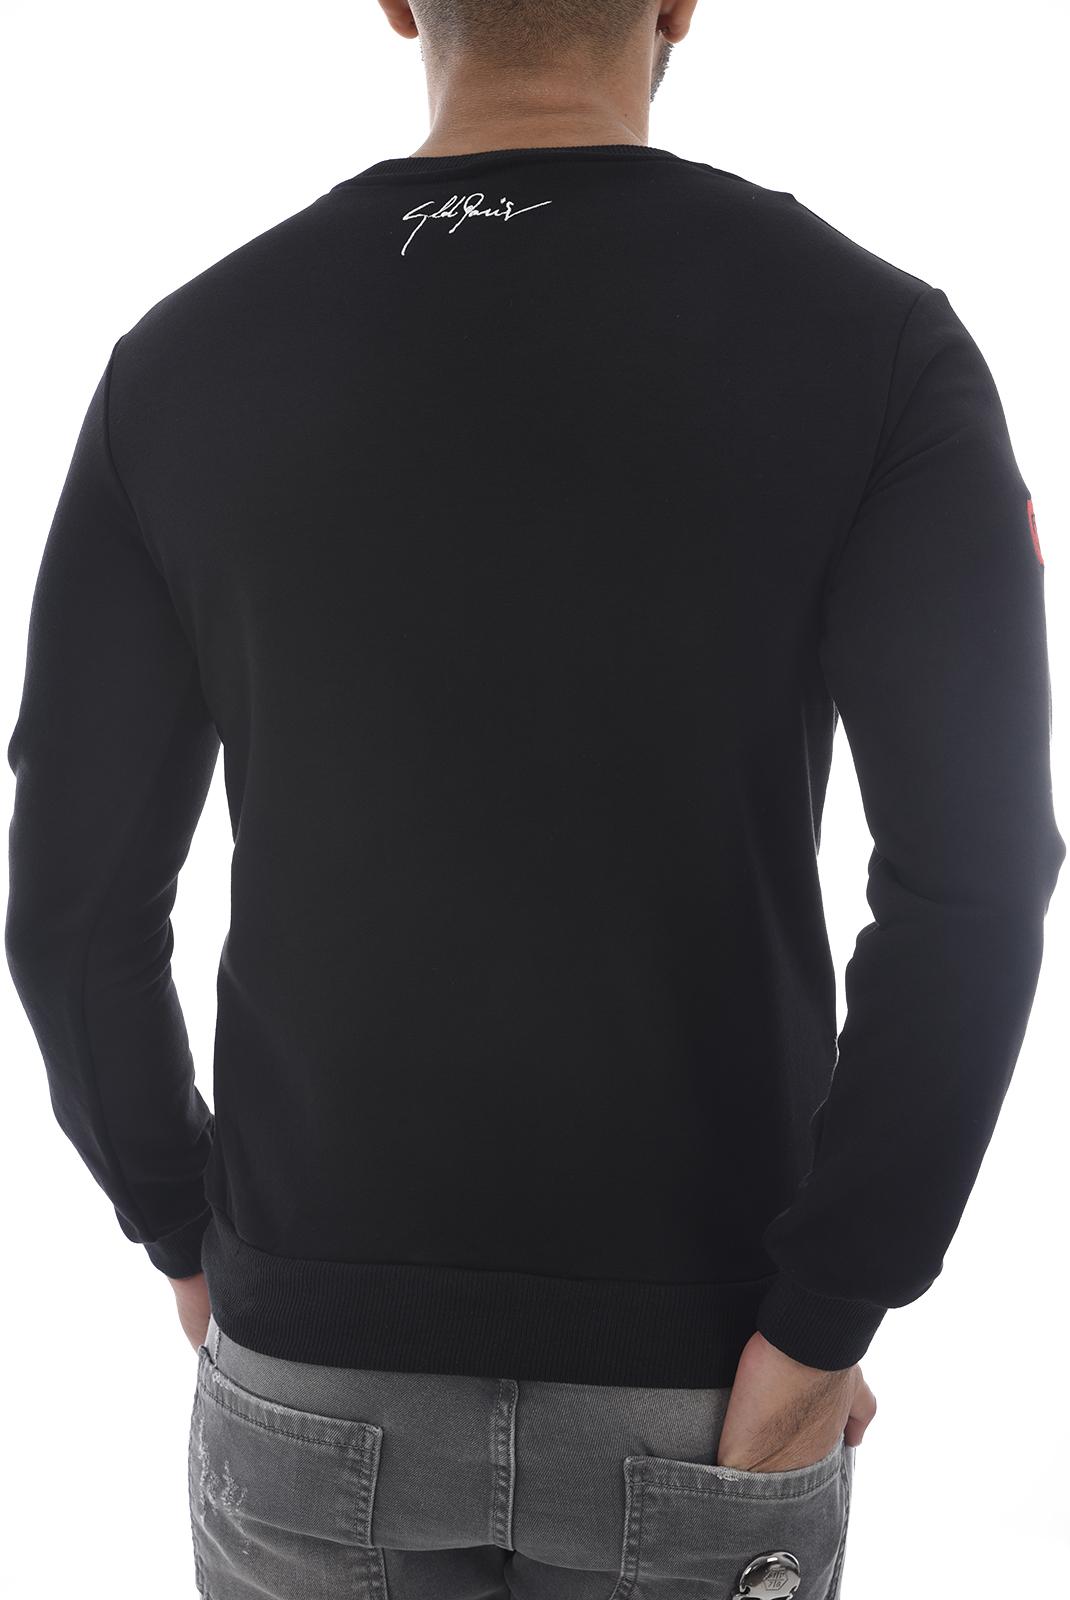 Sweatshirts  Goldenim paris 1008 NOIR